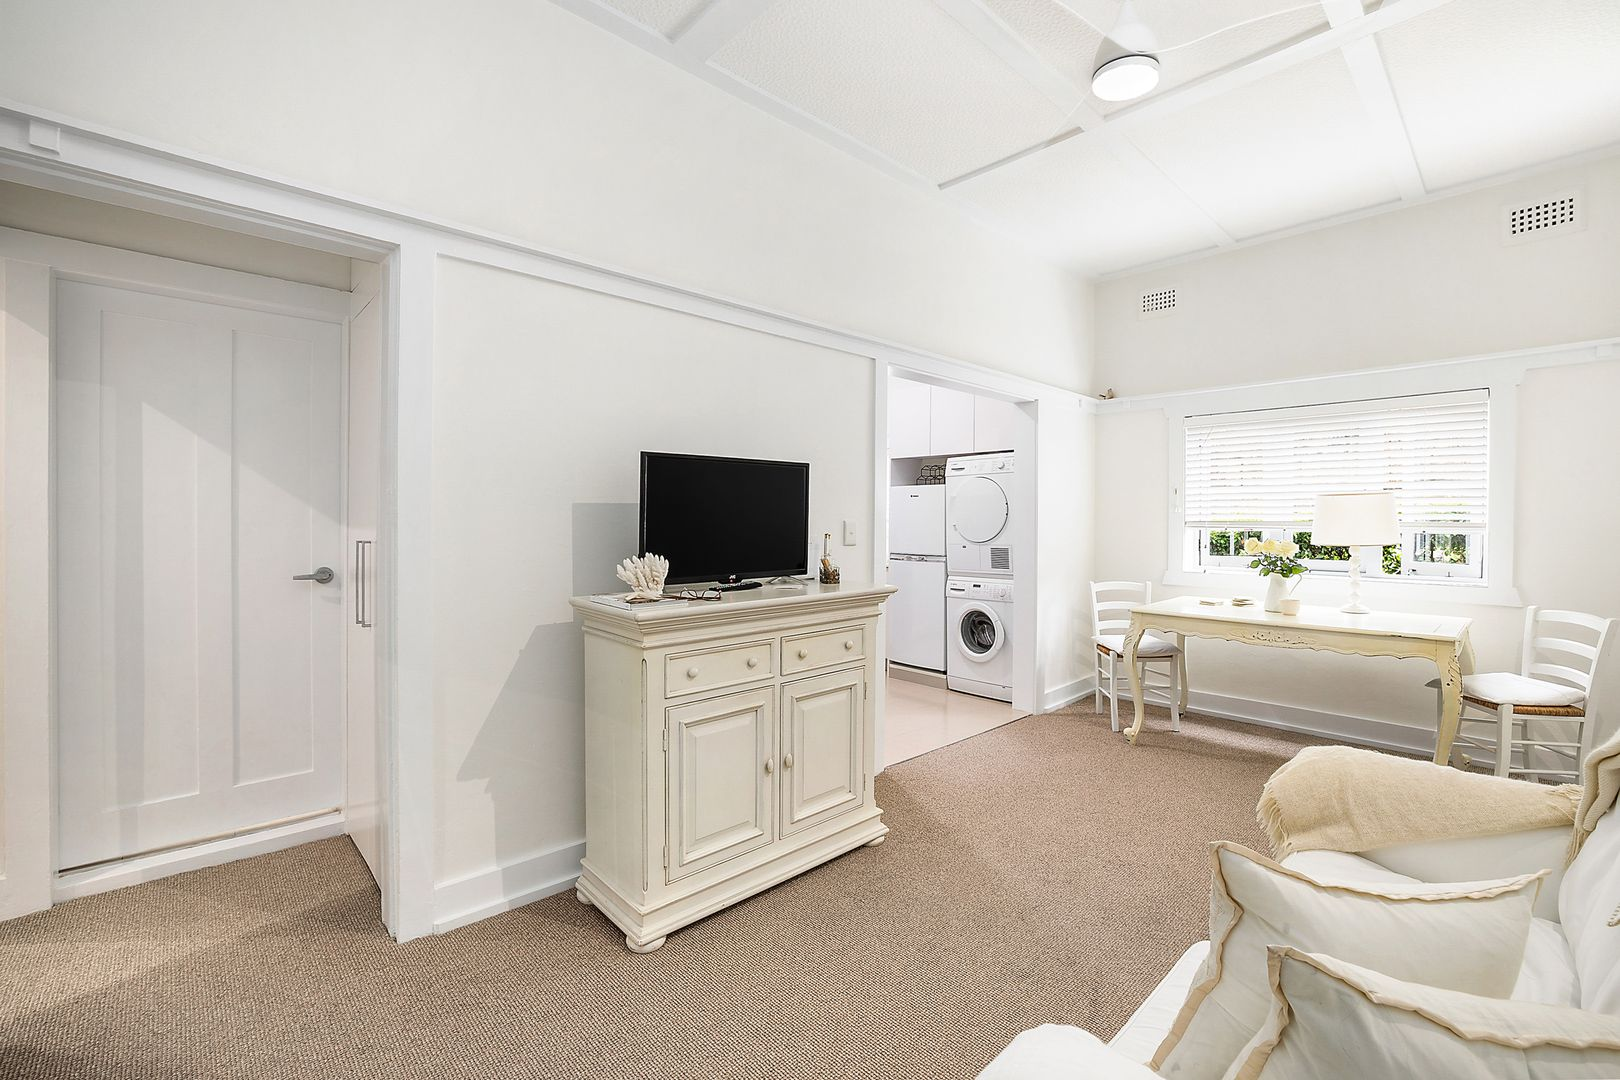 17/27 Lavender Street, Lavender Bay NSW 2060, Image 0